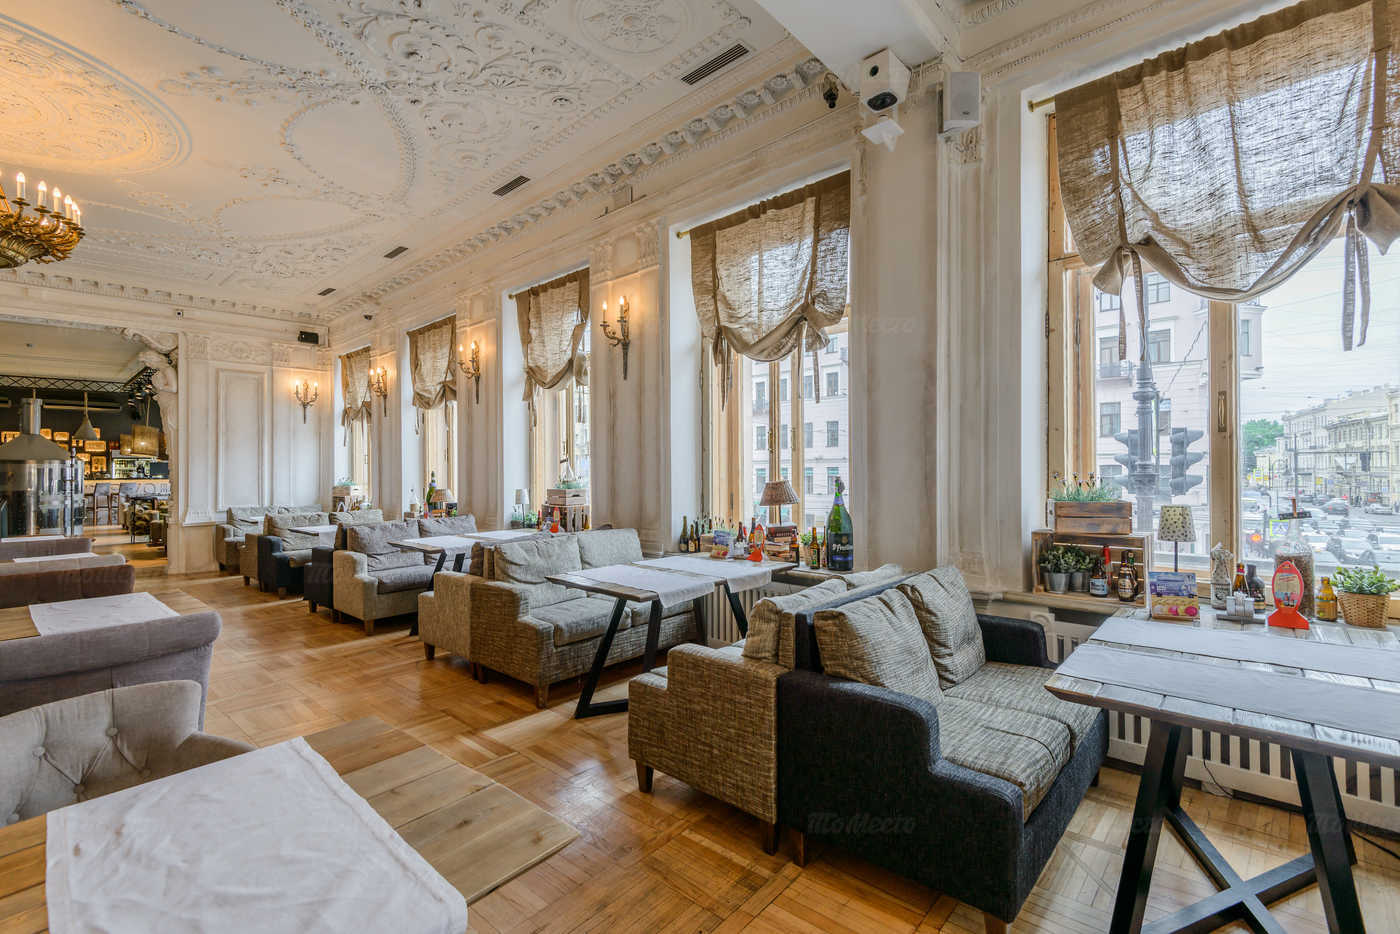 Ресторан Шато Винтаж (Chateau Vintage) на Невском проспекте фото 14